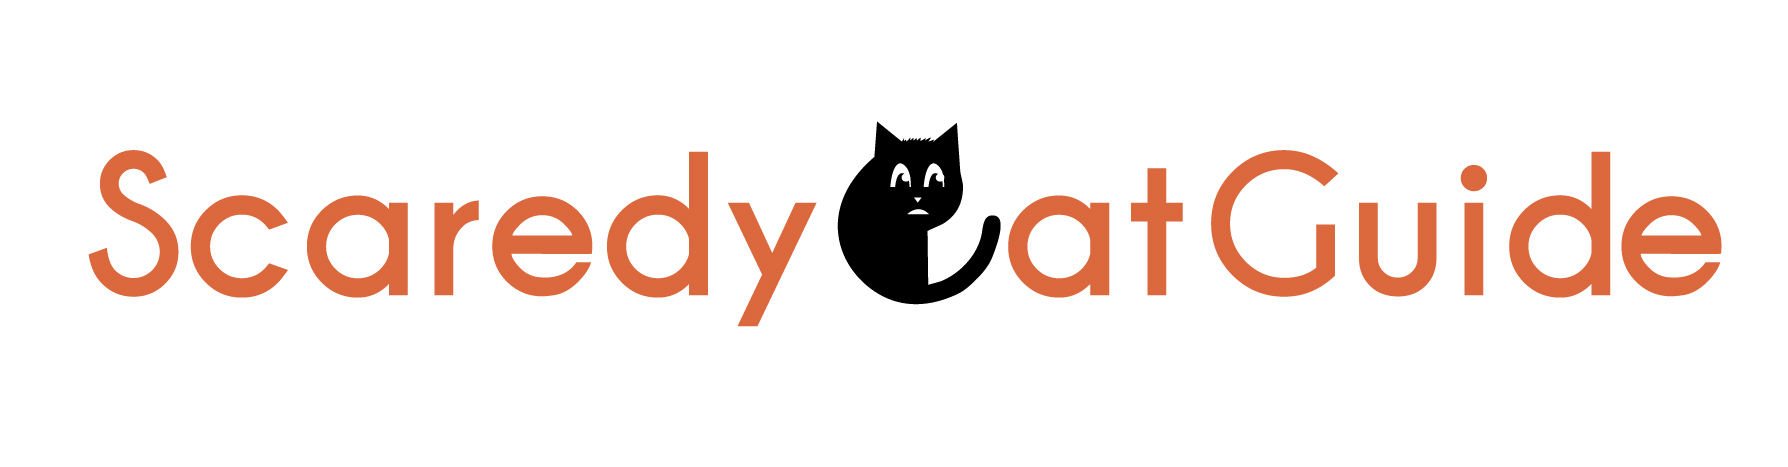 Scaredy Cat Guide Logo..jpg